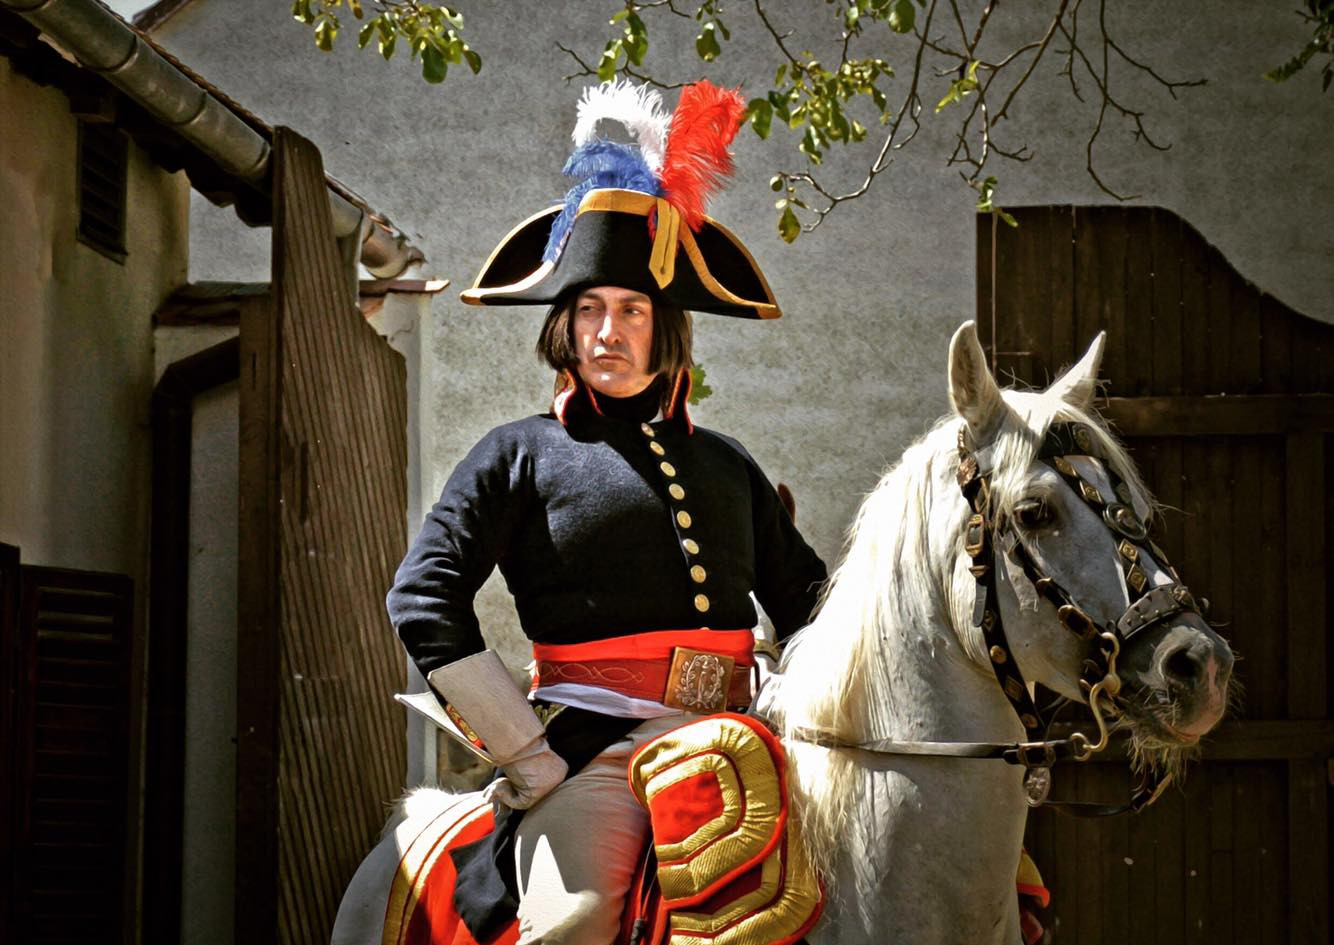 Bonaparte_à_cheval.jpg